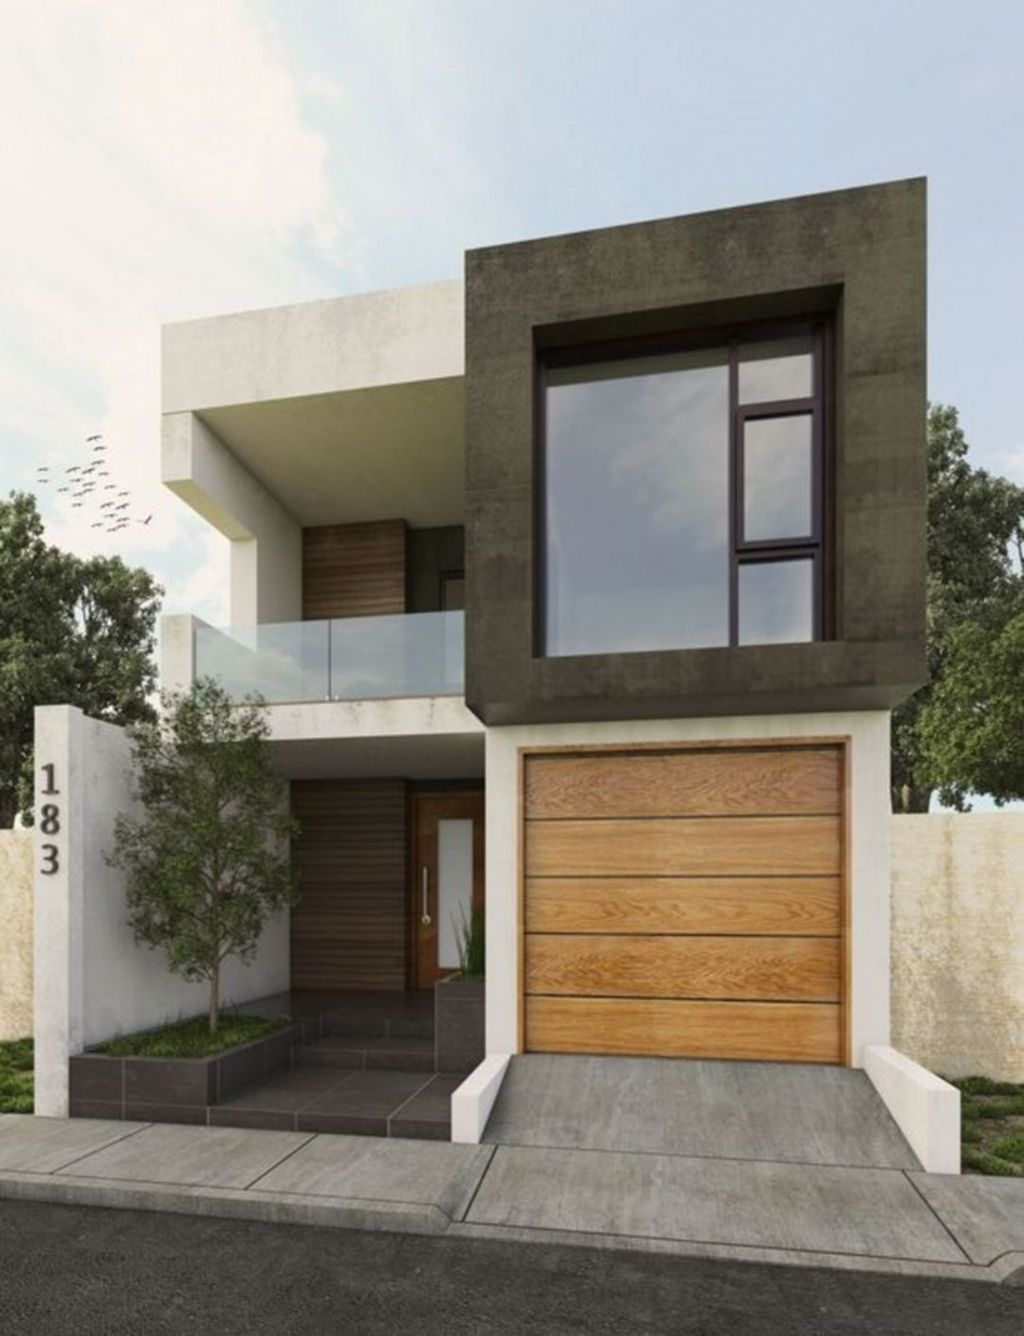 33 Stunning Small House Design Ideas Small Modern Home Modern Minimalist House House Architecture Design